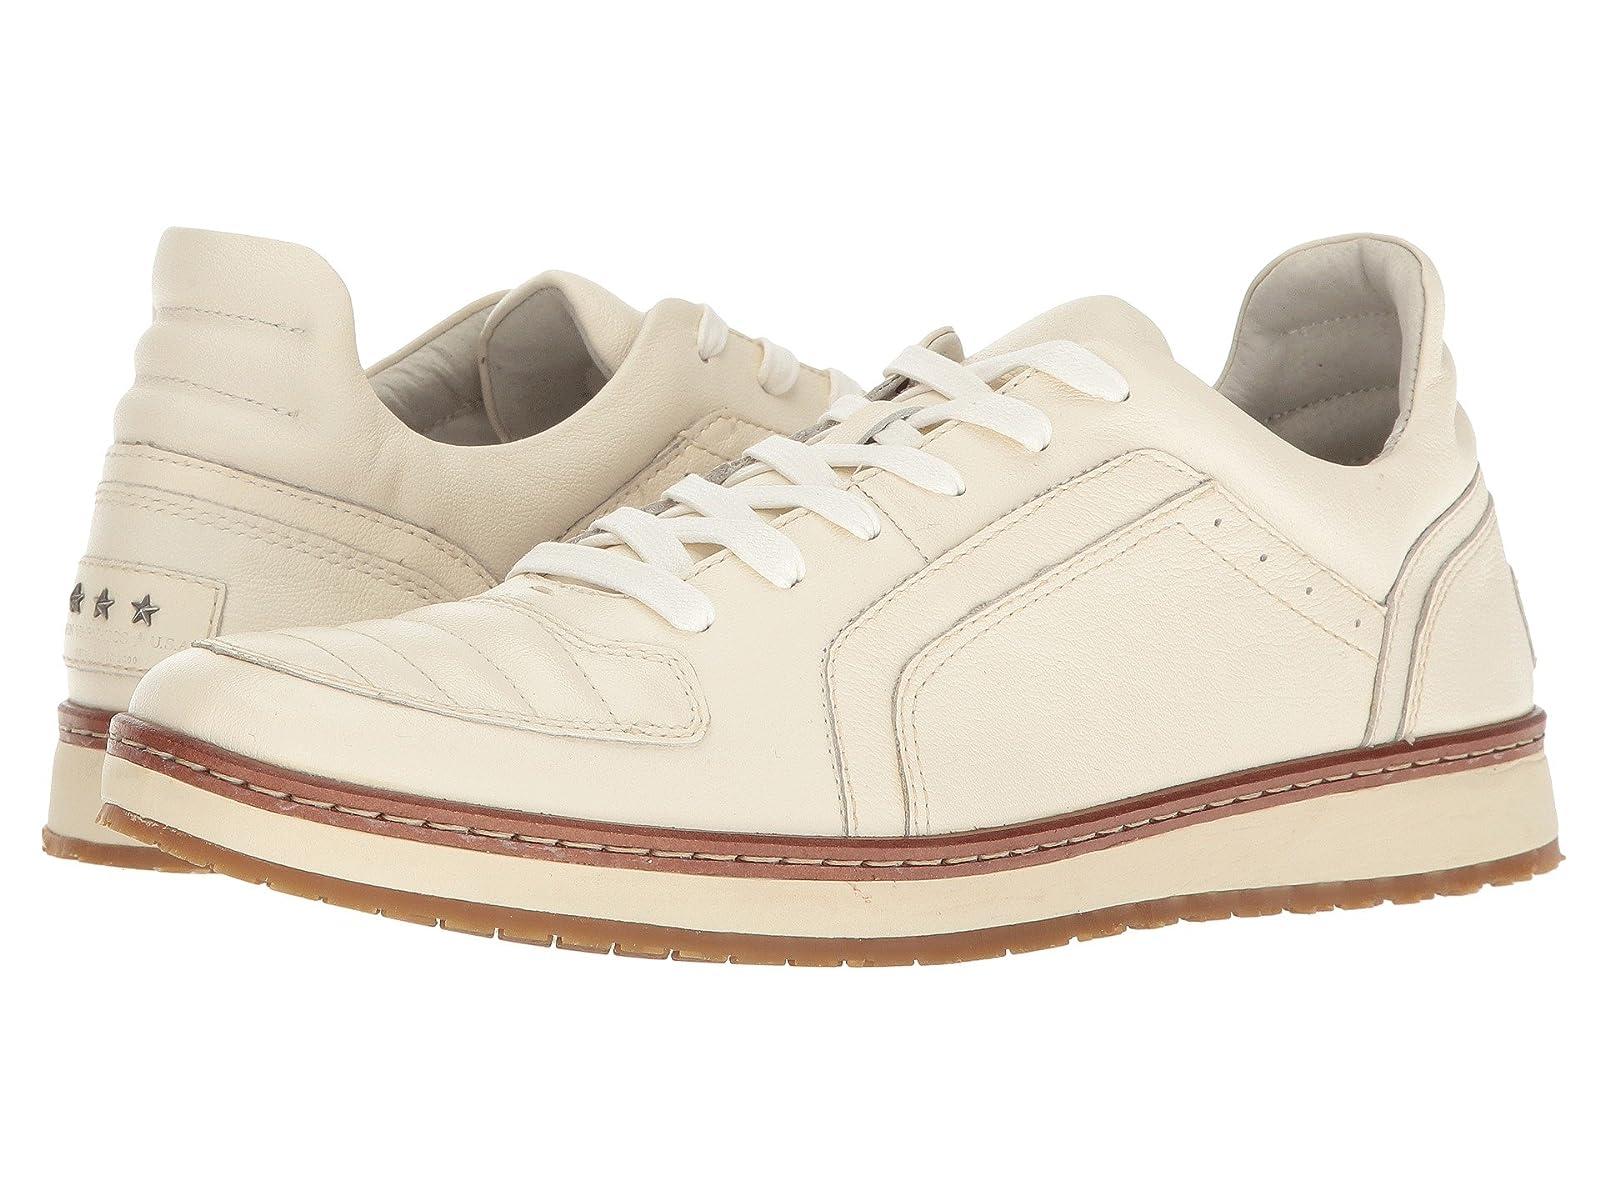 John Varvatos Barrett Creeper LowCheap and distinctive eye-catching shoes